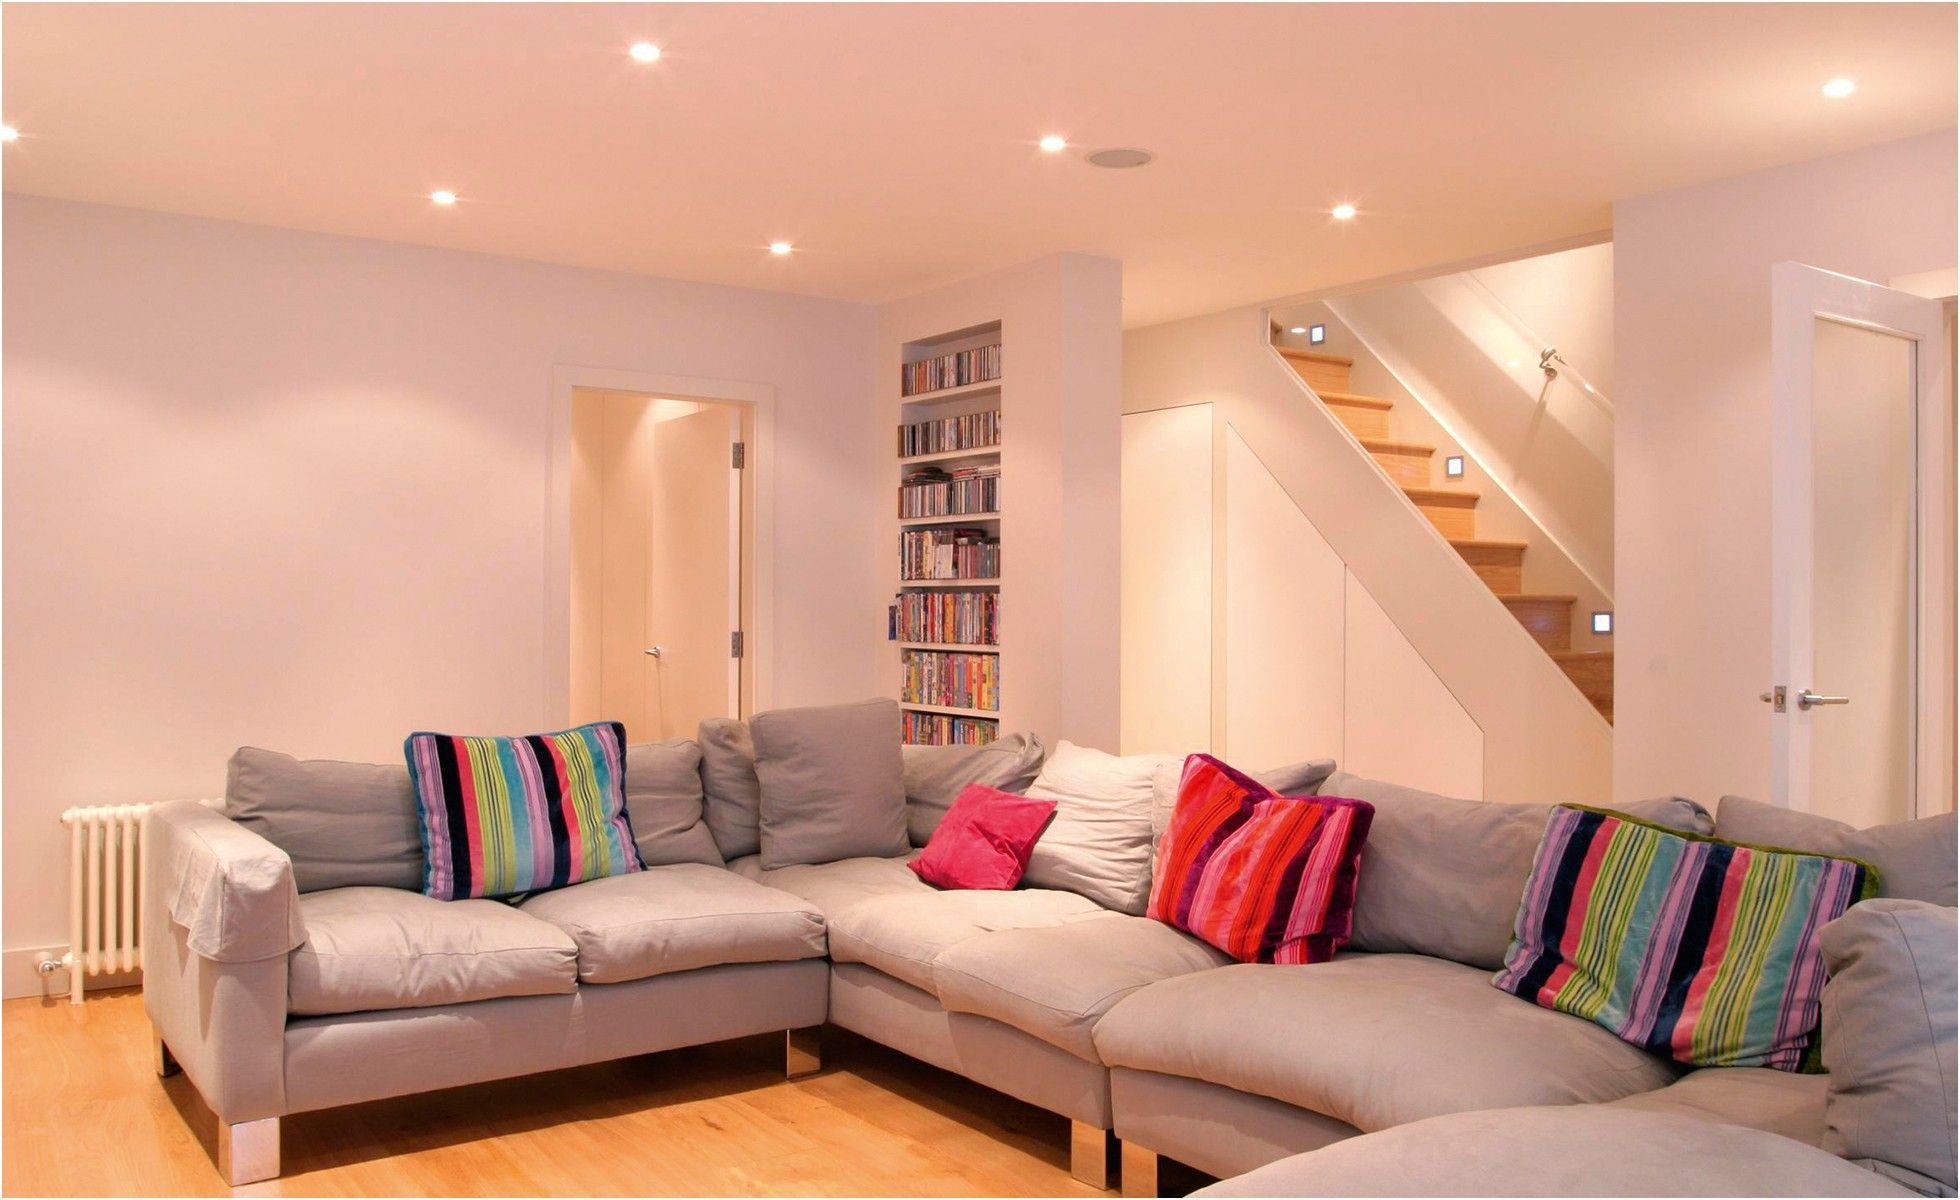 How To Convert A Basement Homebuilding Renovating From Basement - Bathroom conversions cost